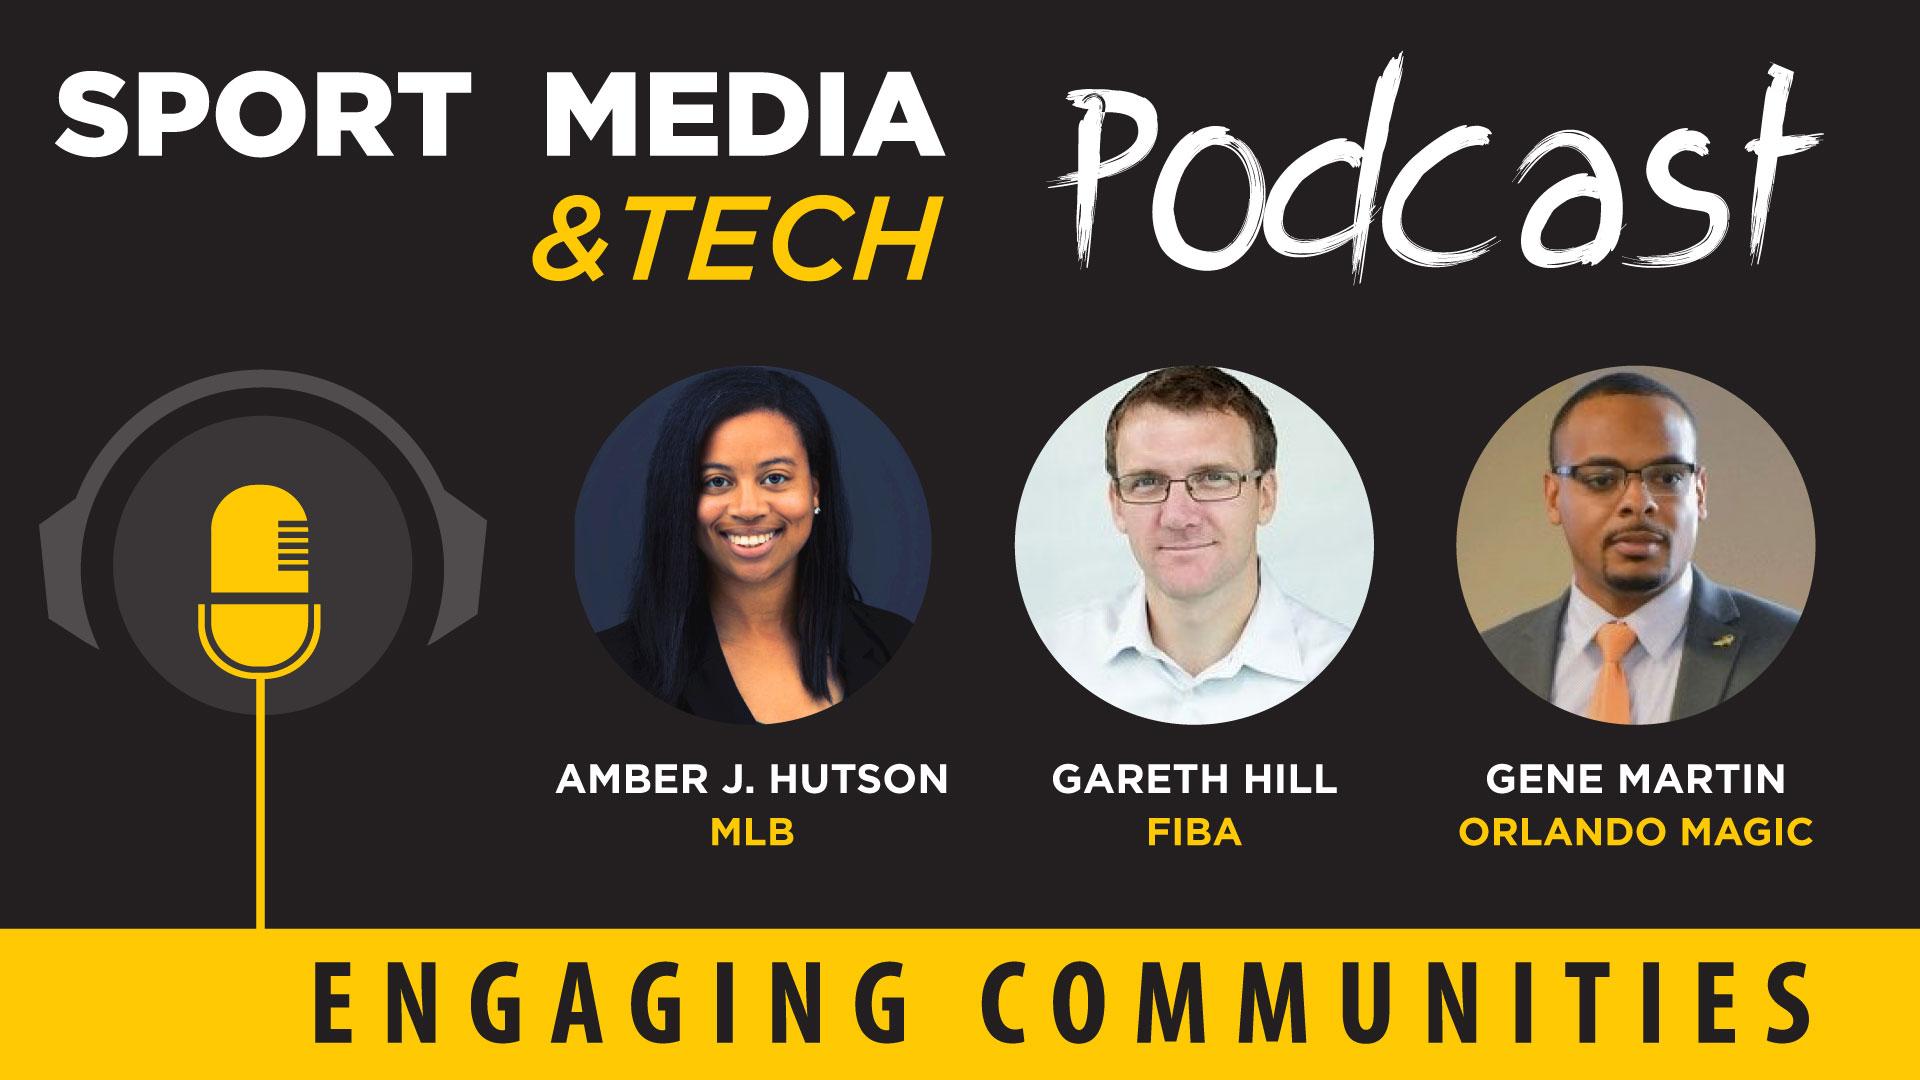 Episode 2: Engaging Communities